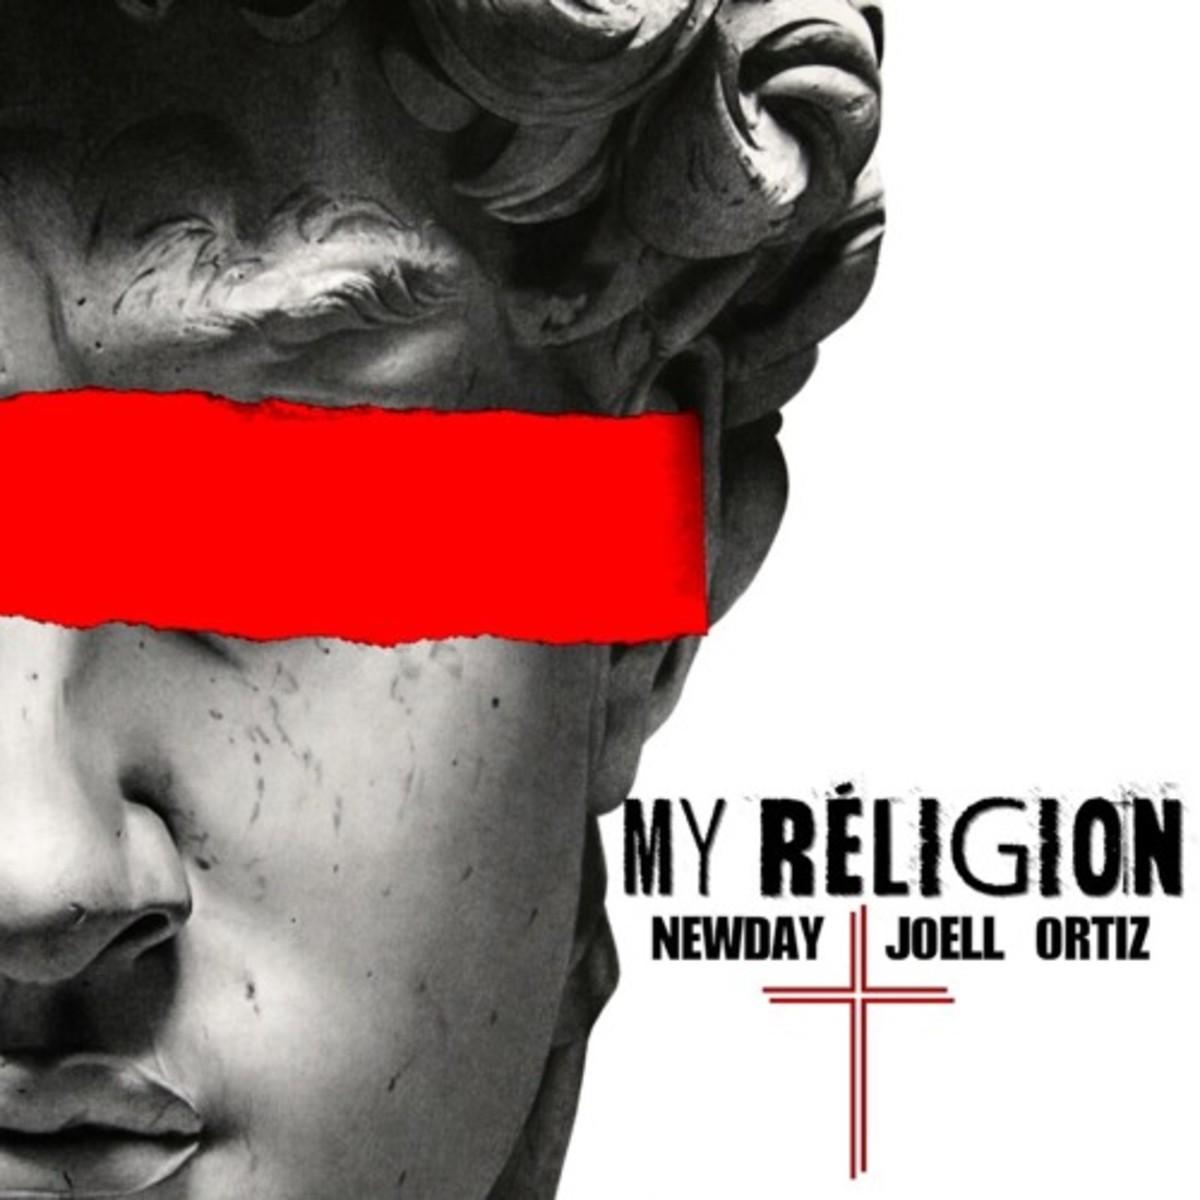 newday-my-religion.jpg